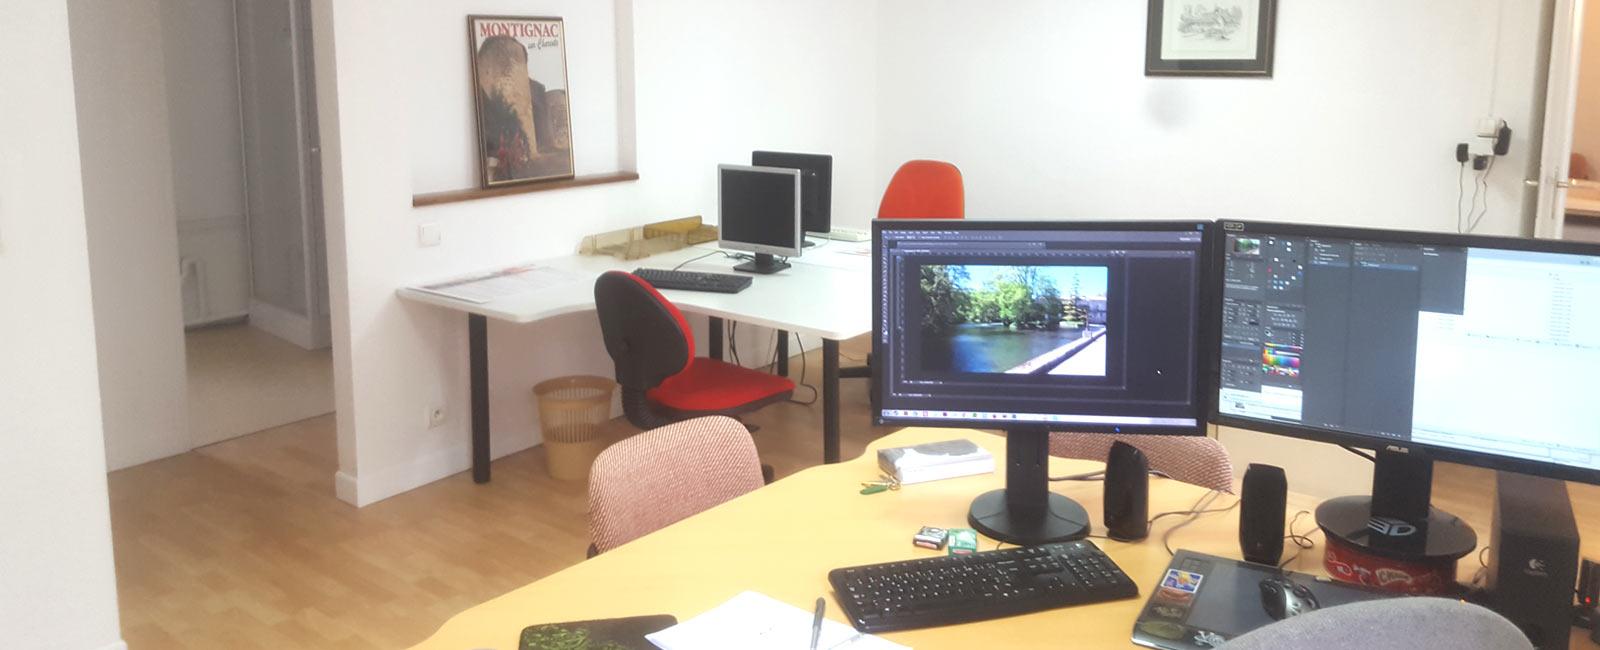 Le-Quai-coworking-angouleme-slider-06